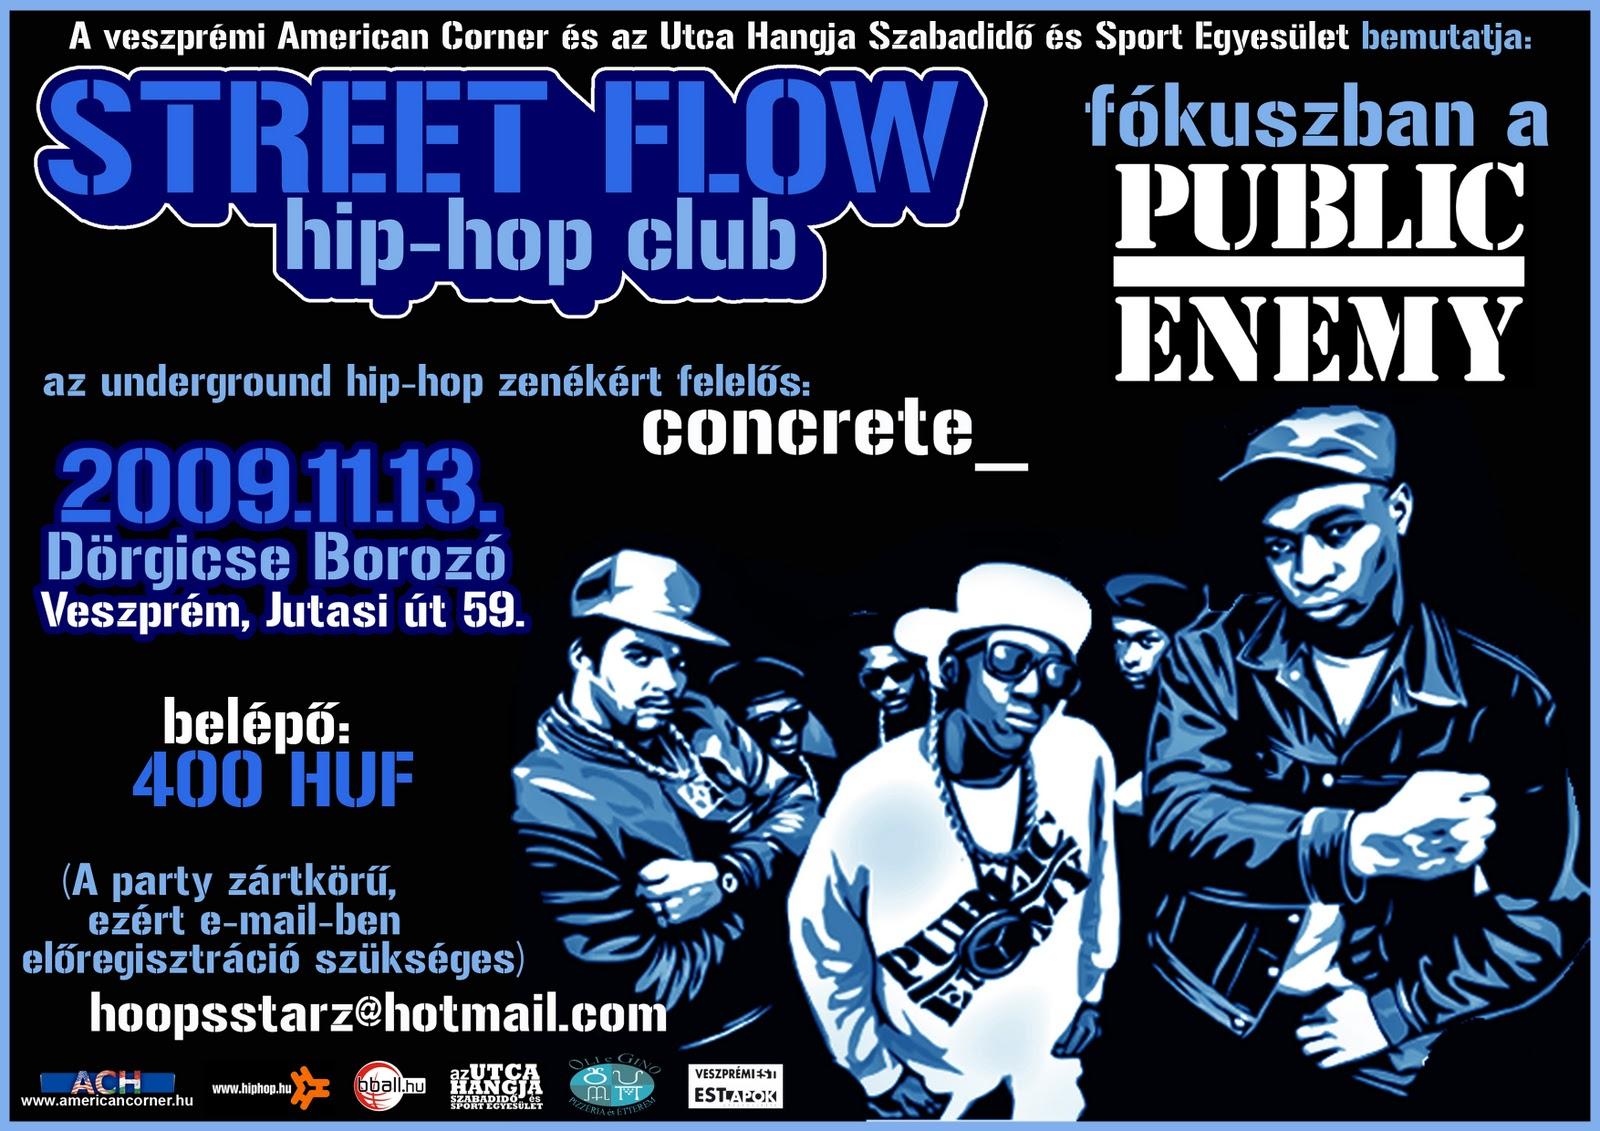 http://4.bp.blogspot.com/-xc8gikNAVt8/TwnTjxTTh-I/AAAAAAAAB18/8w4ZiZVNzG0/s1600/street+flow+hip+hop+club+-+public+enemy.jpg